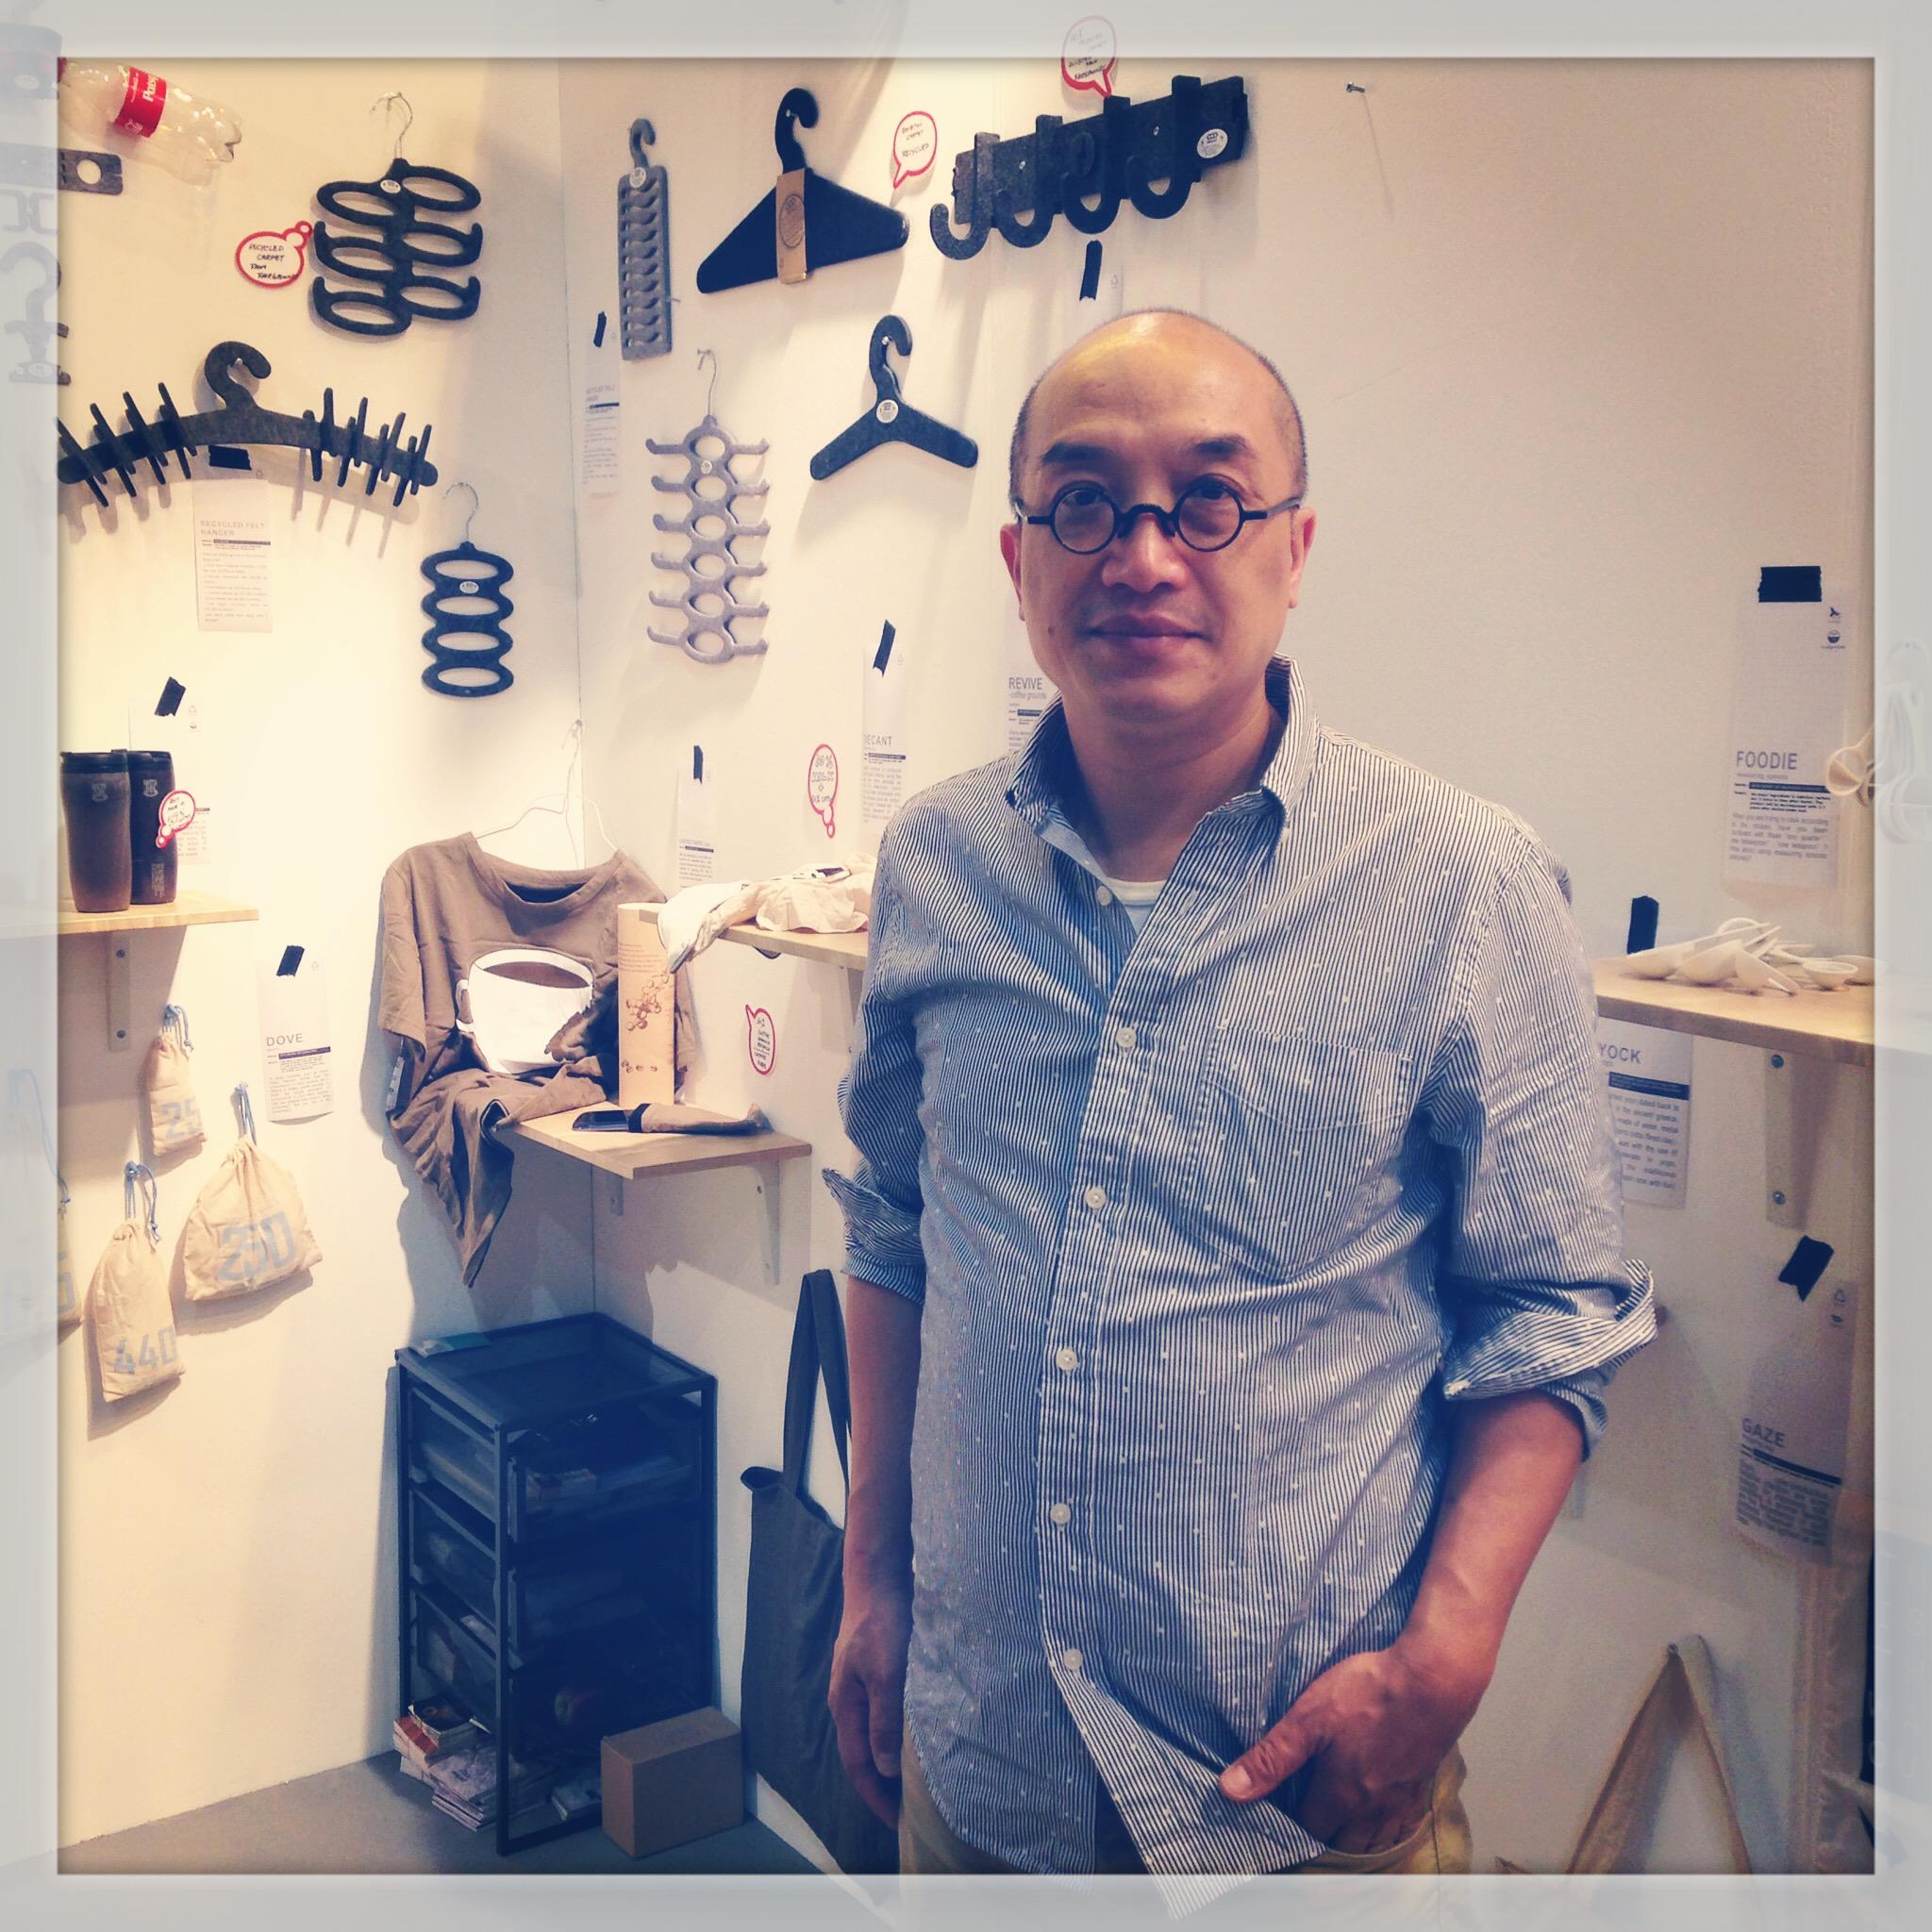 Image: Ooobject founder Gewah Lam Cheong-leung